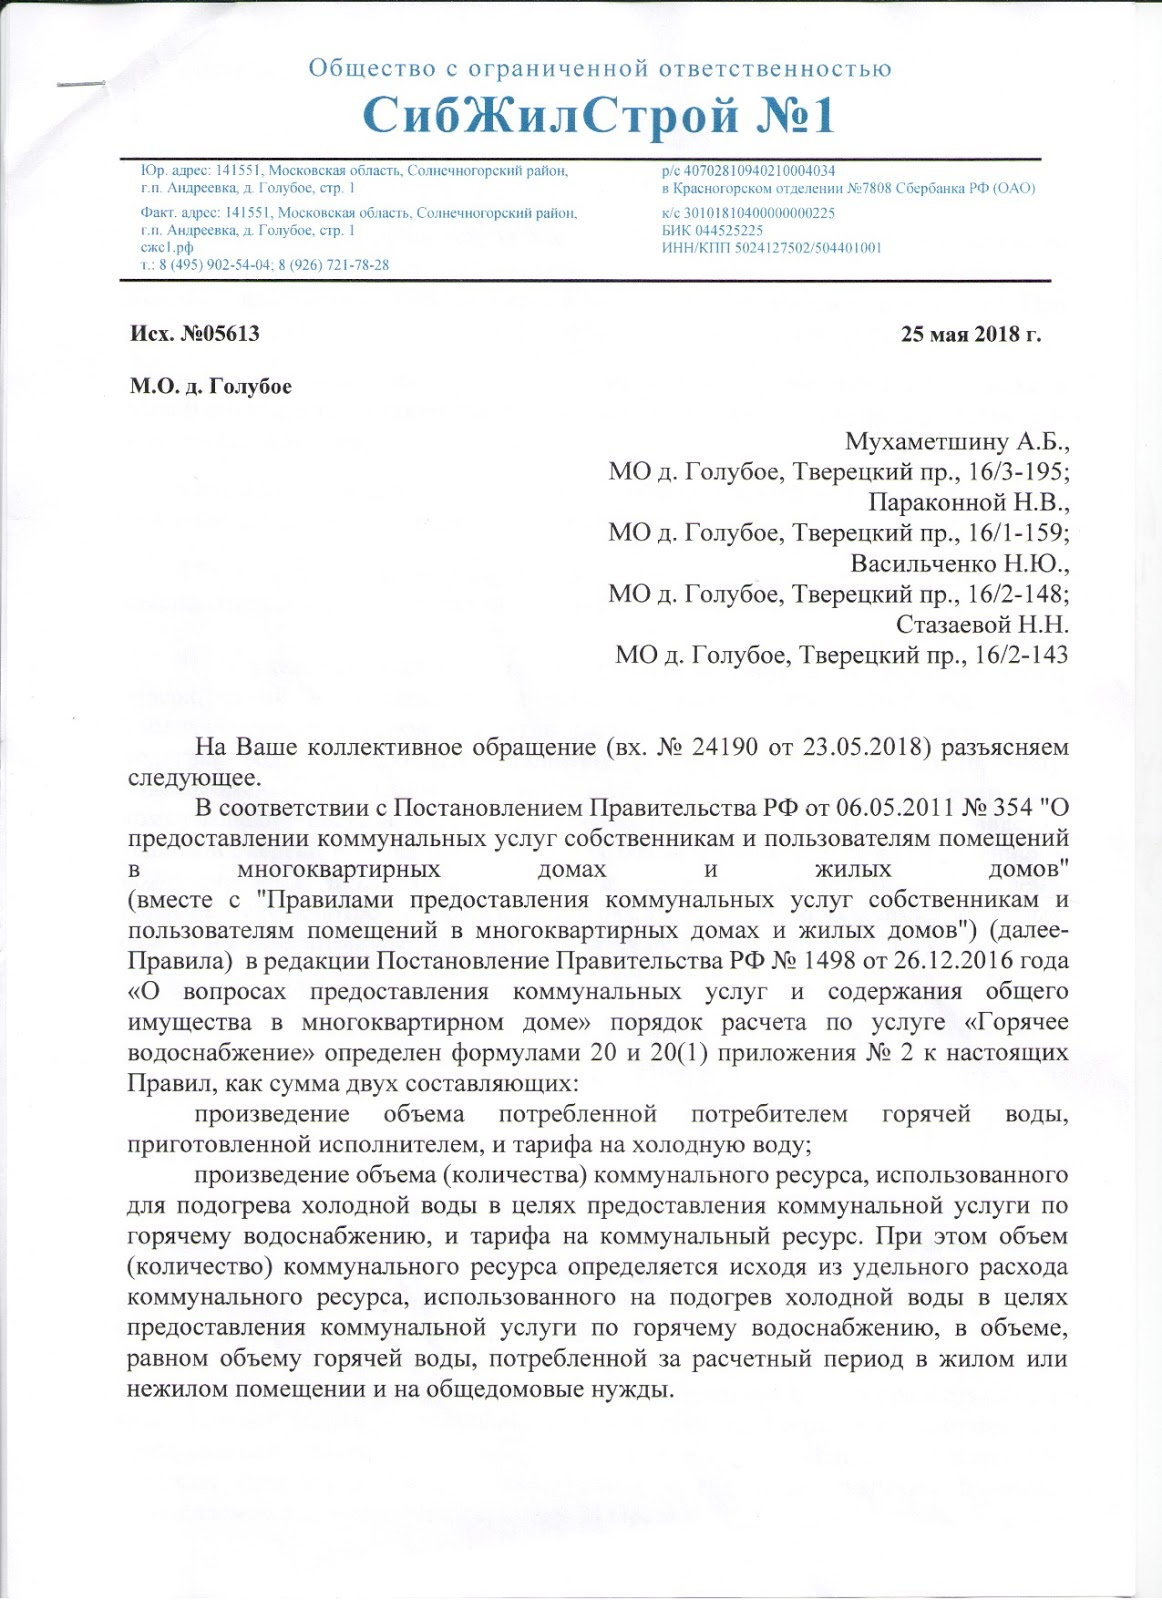 Ответ УК СЖС1 от 25.05.2018 по начислениям за подогрев ГВС